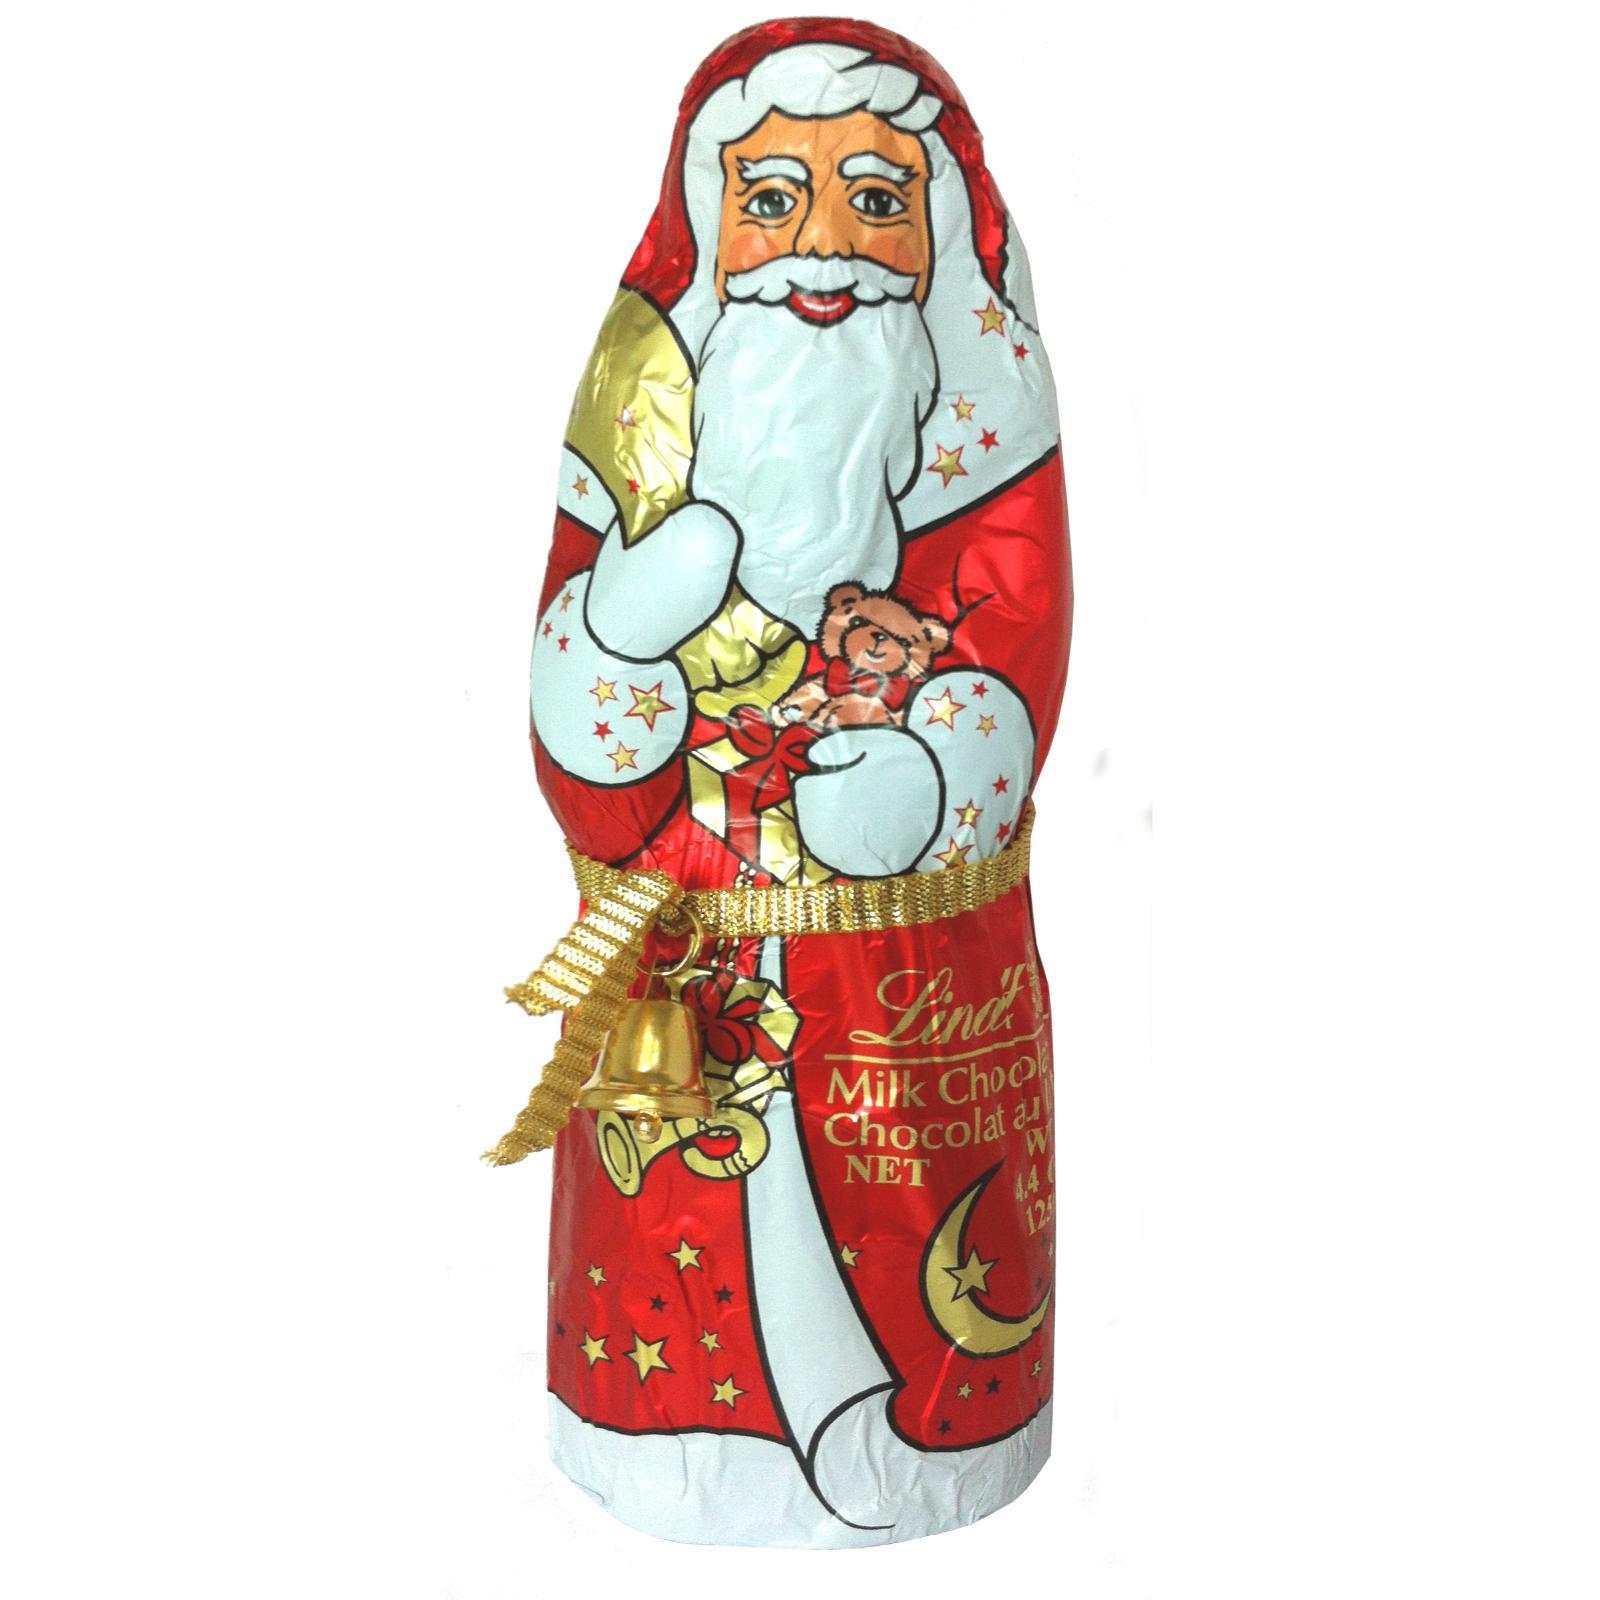 Lindt Milk Chocolate Santa - Christmas Special